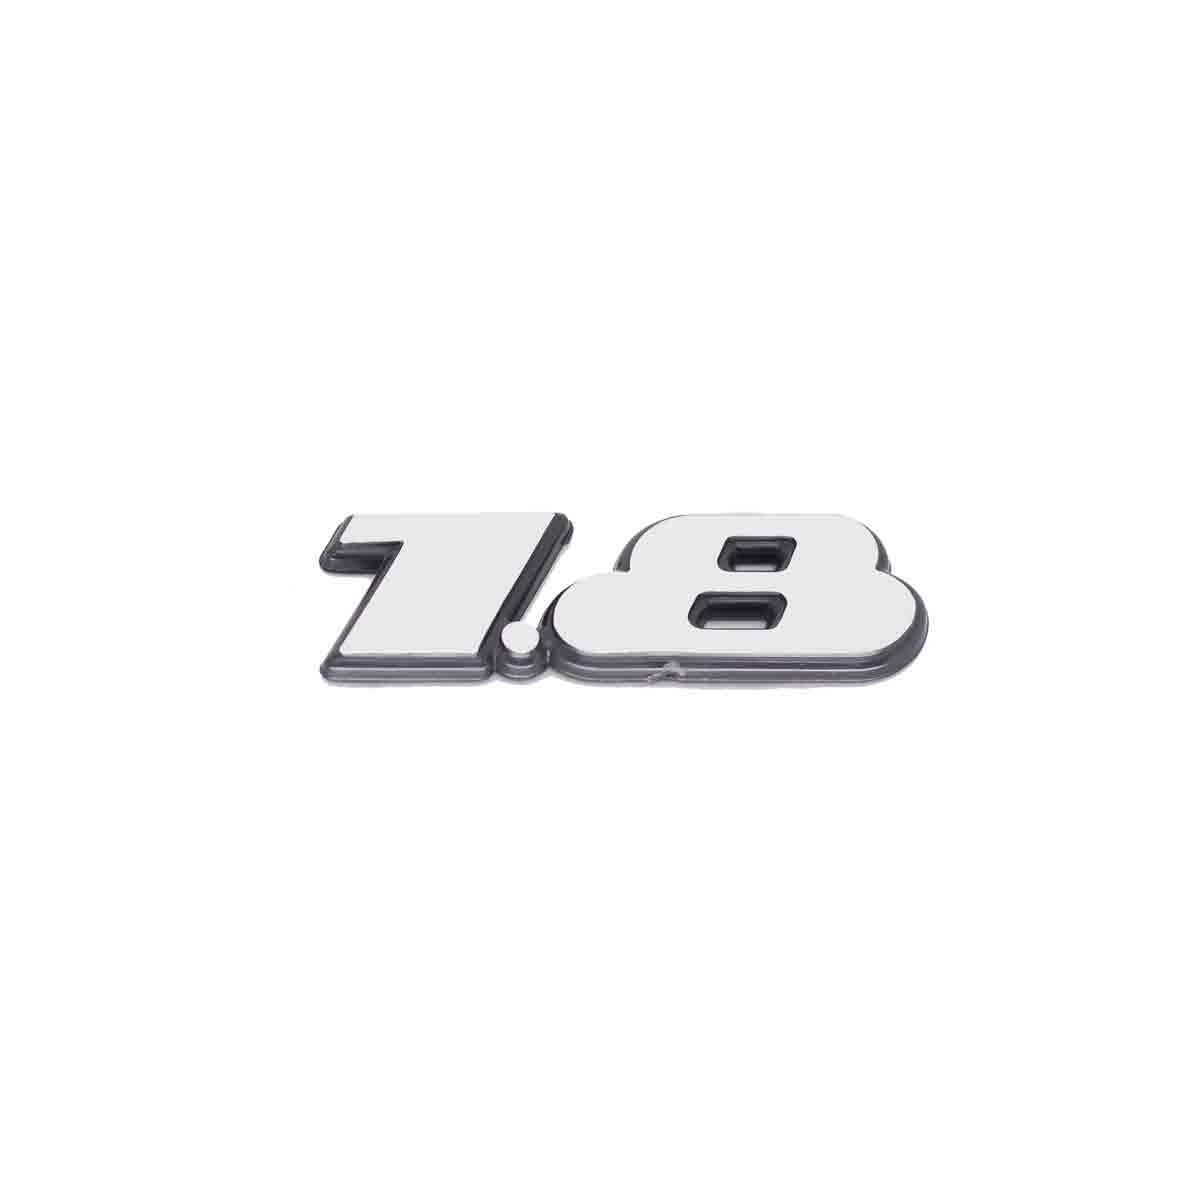 Emblema 1.8 Golf 97/99 Escovado